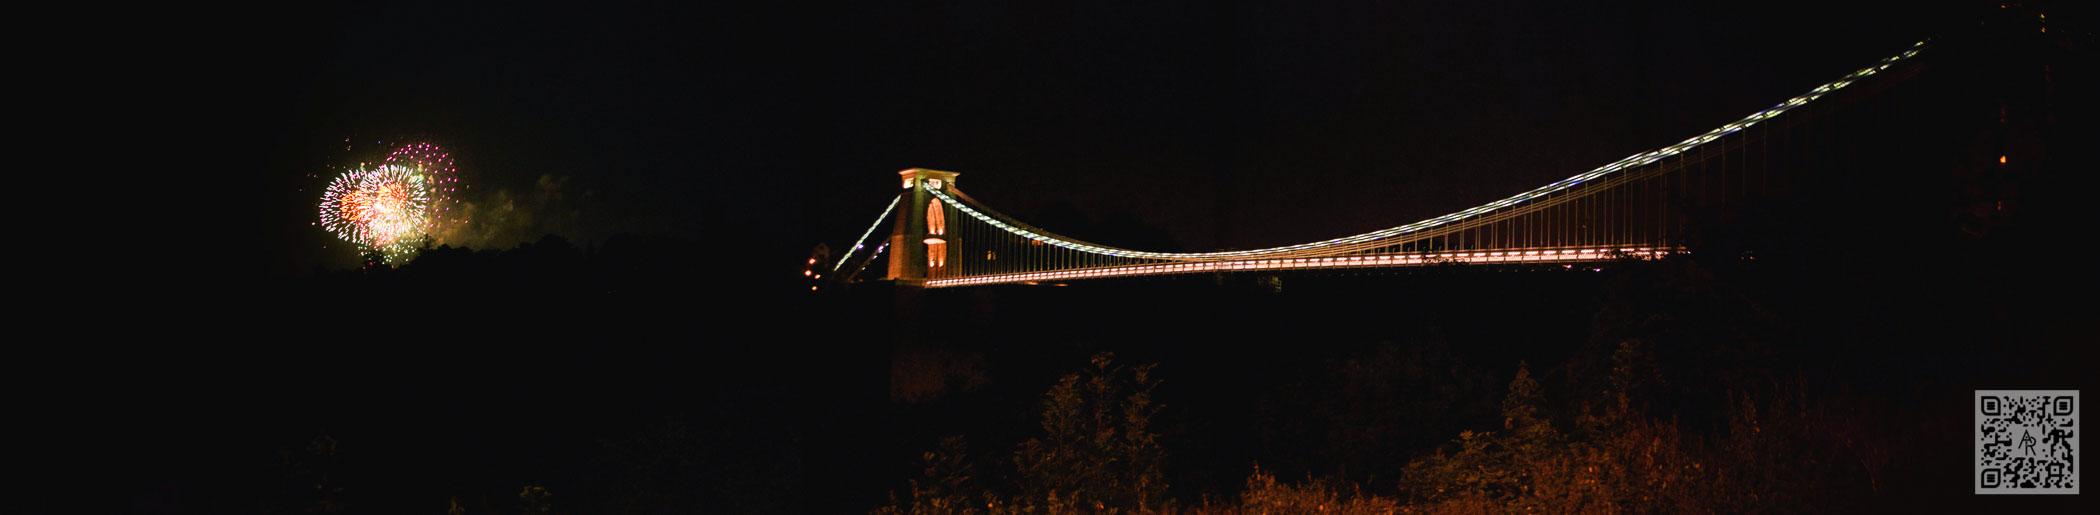 Clifton Suspension Bridge Fireworks